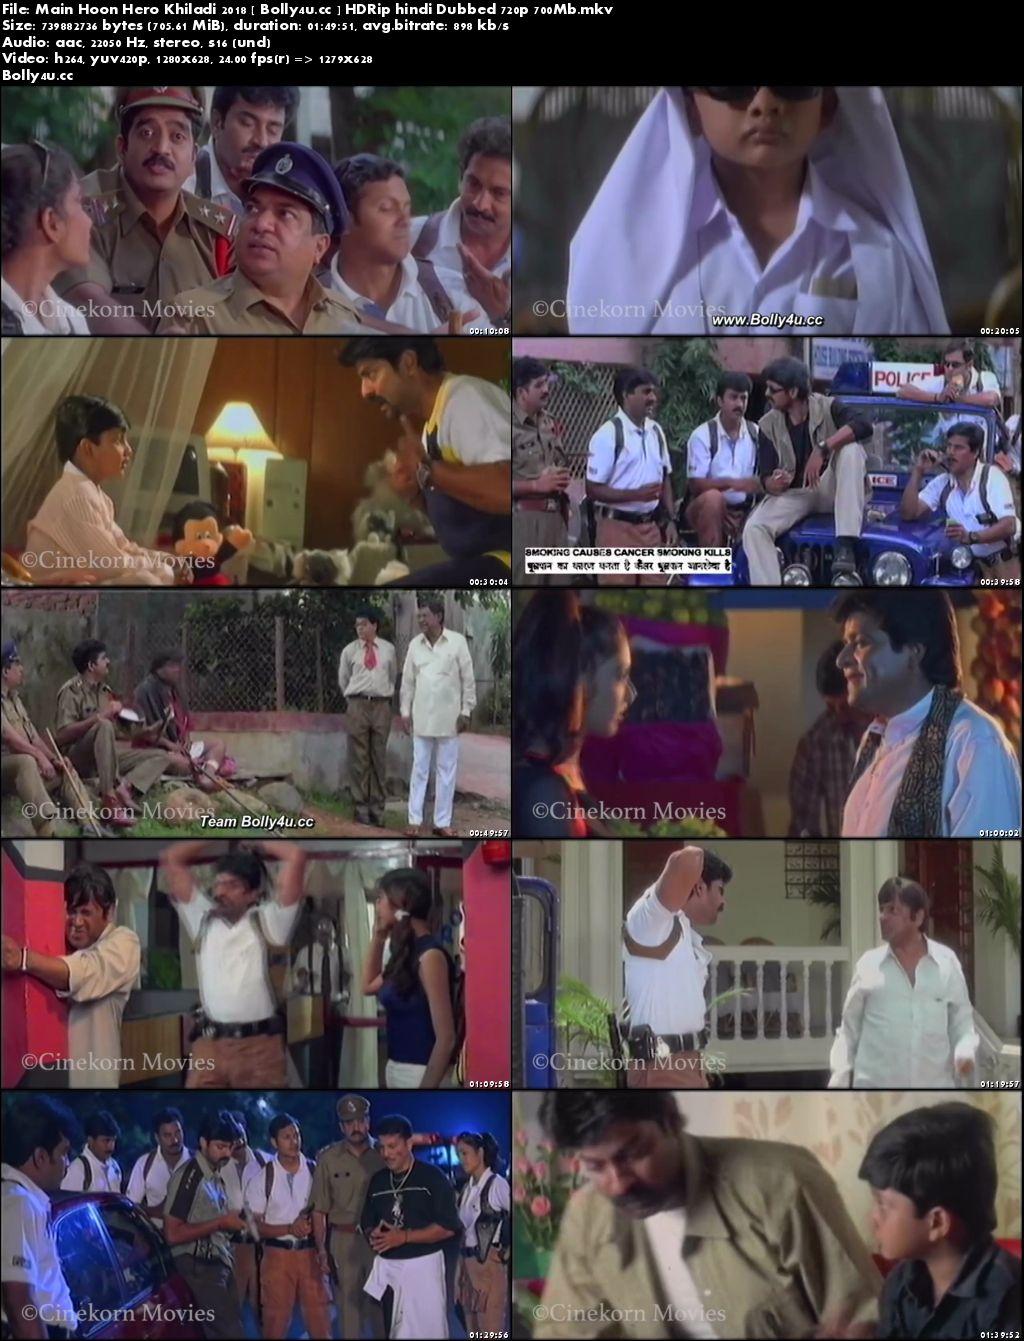 Main Hoon Hero Khiladi 2018 HDRip 350MB Hindi Dubbed 480p Download